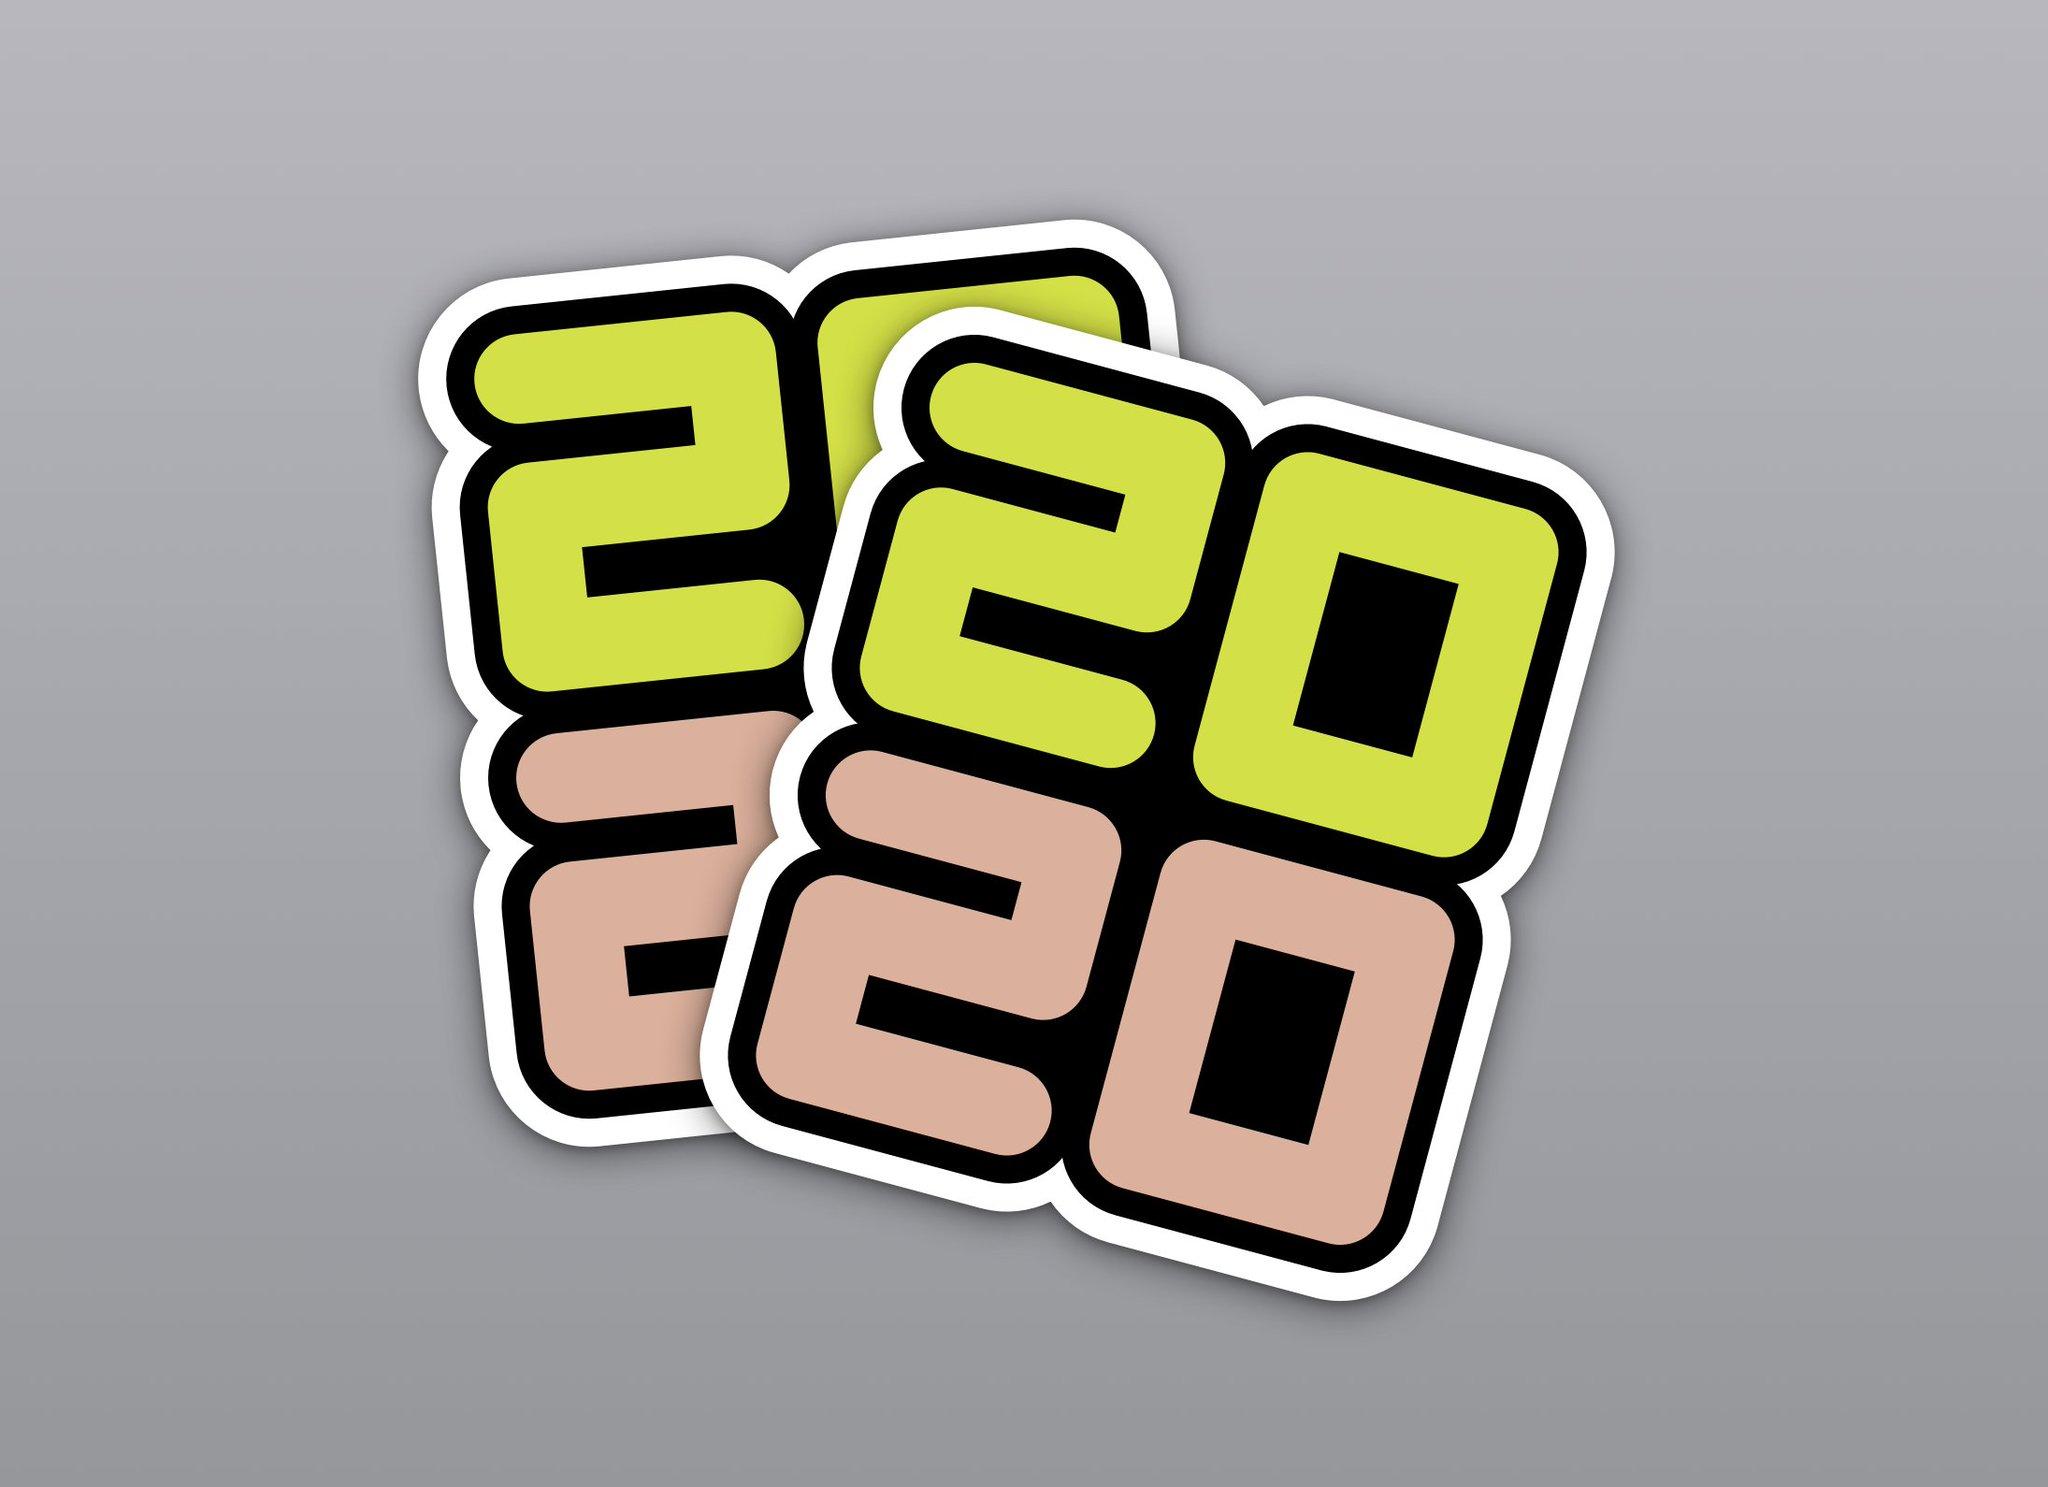 sticker wwdc 2020 wallpaper-ipad basvanderploeg idownloadblog 2020